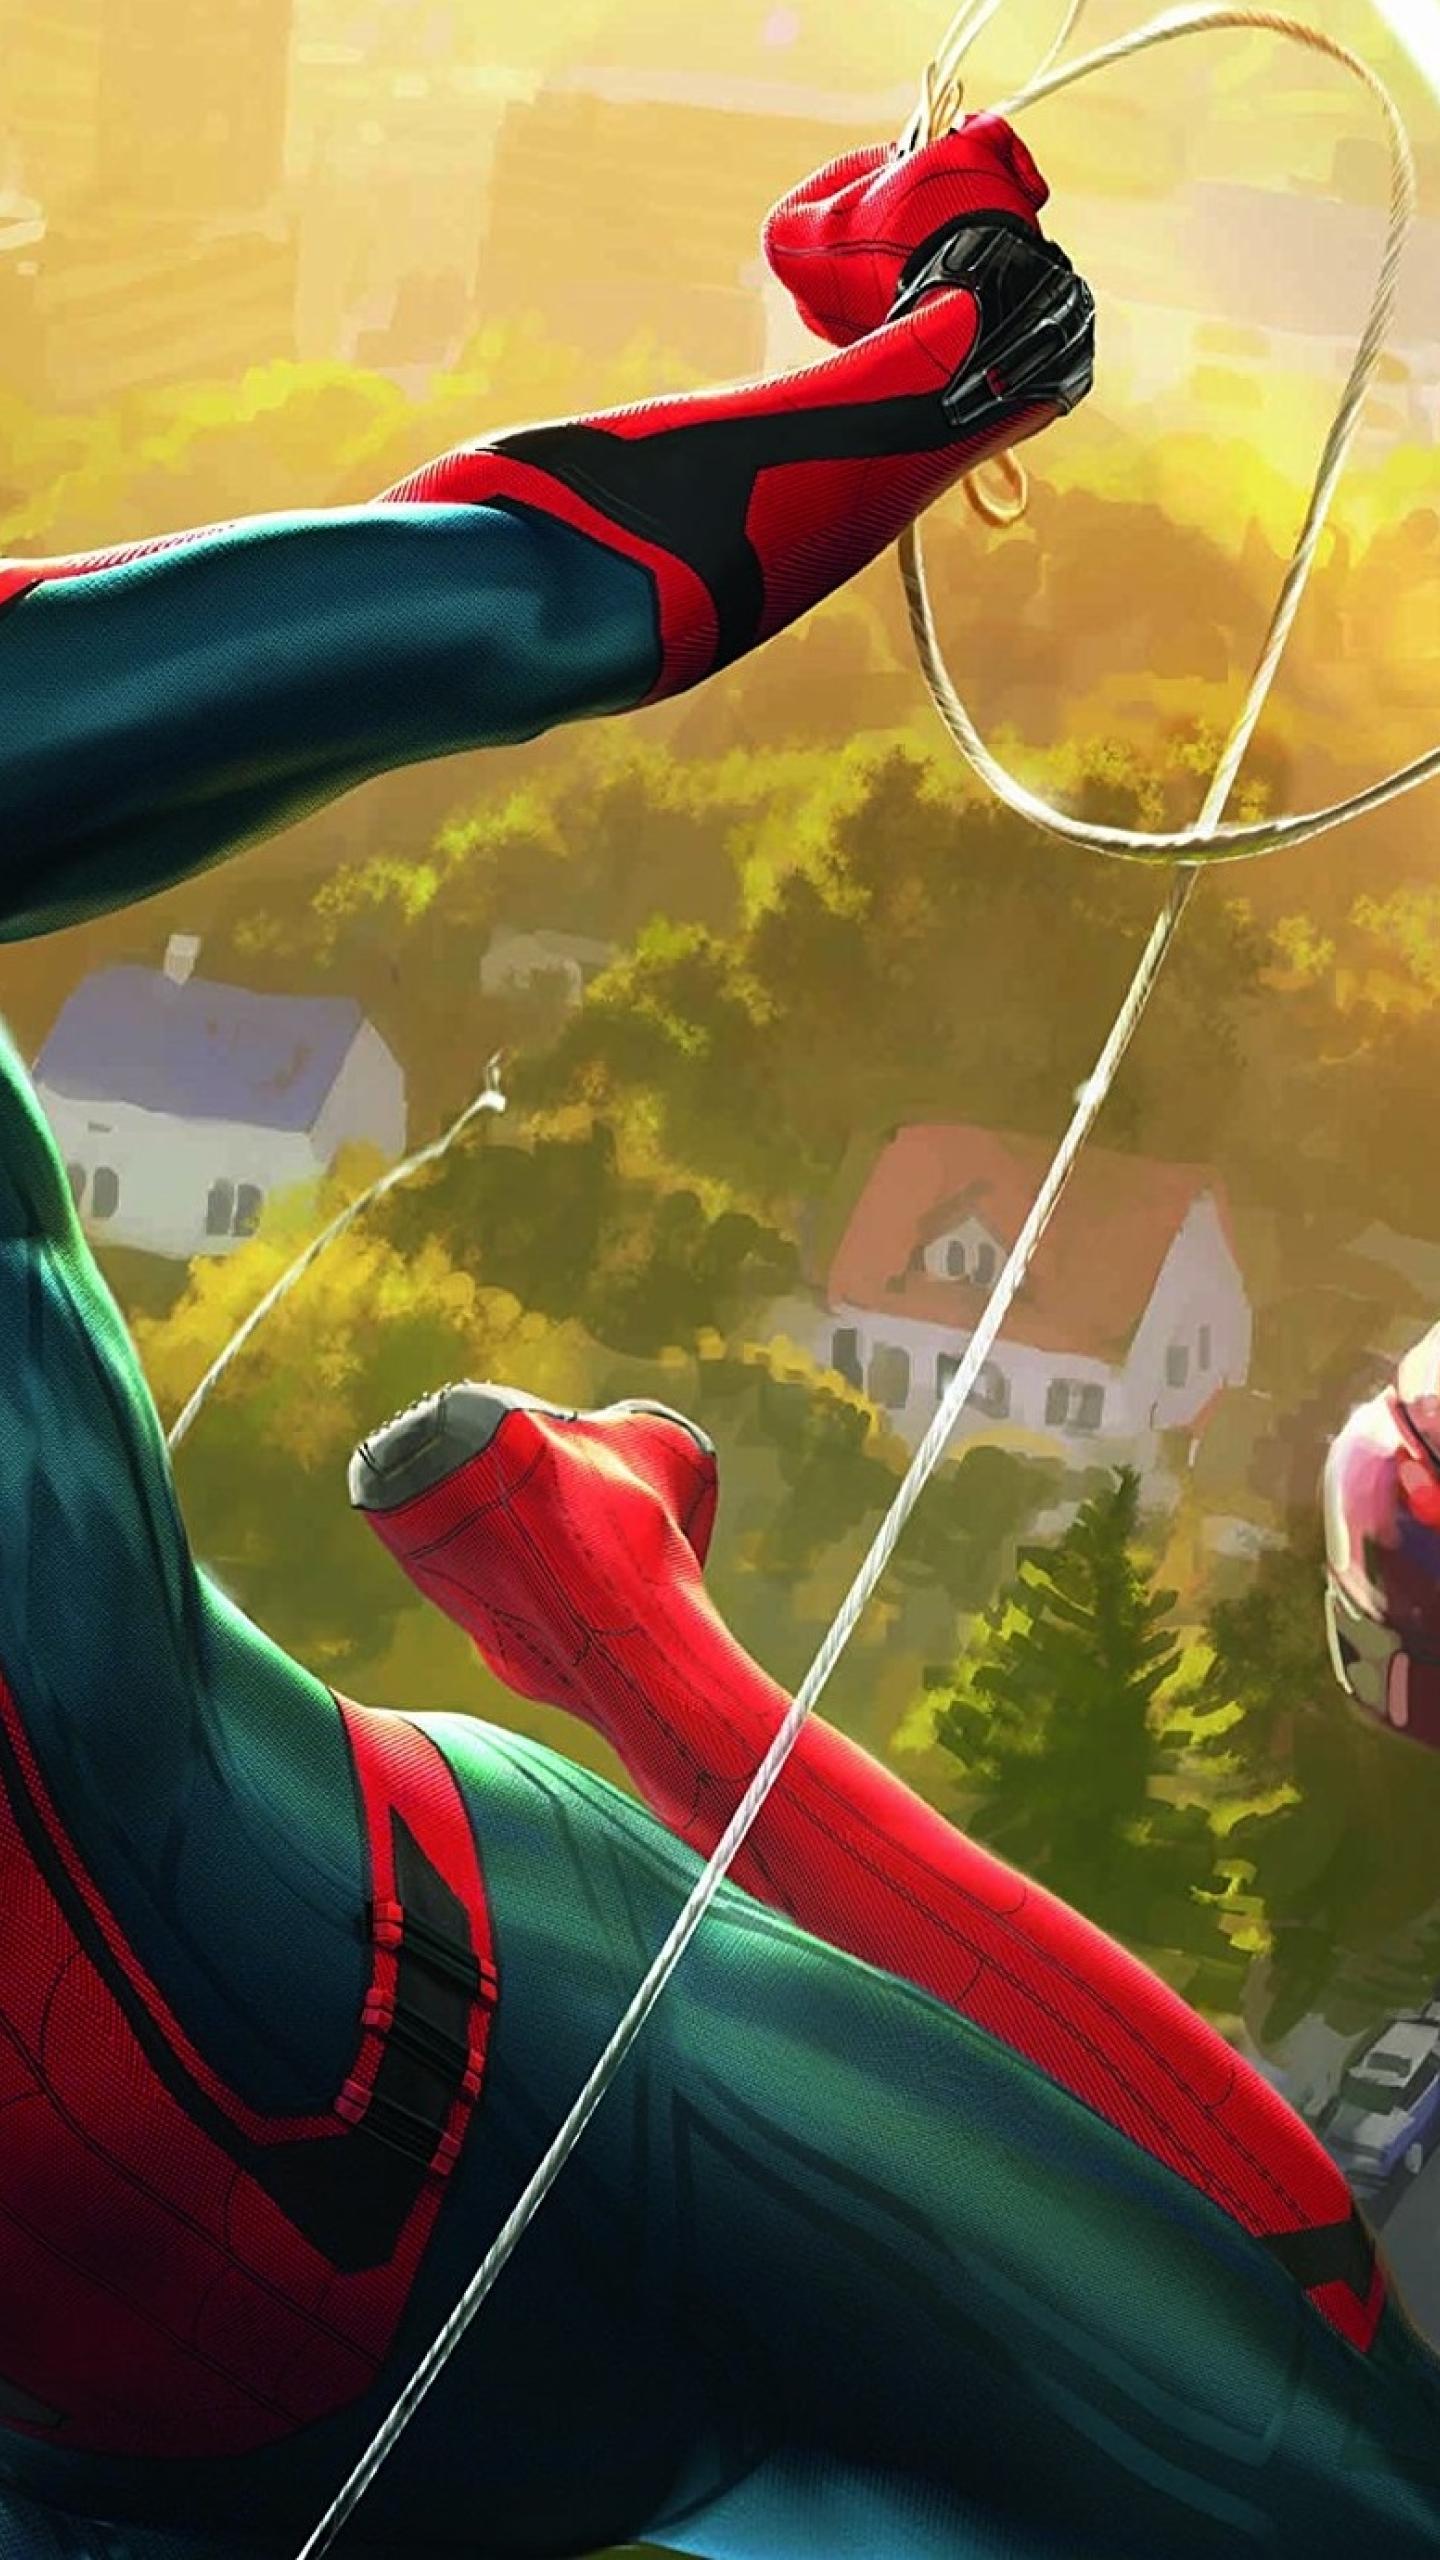 Spiderman And Iron Man Artwork Full Hd 2k Wallpaper